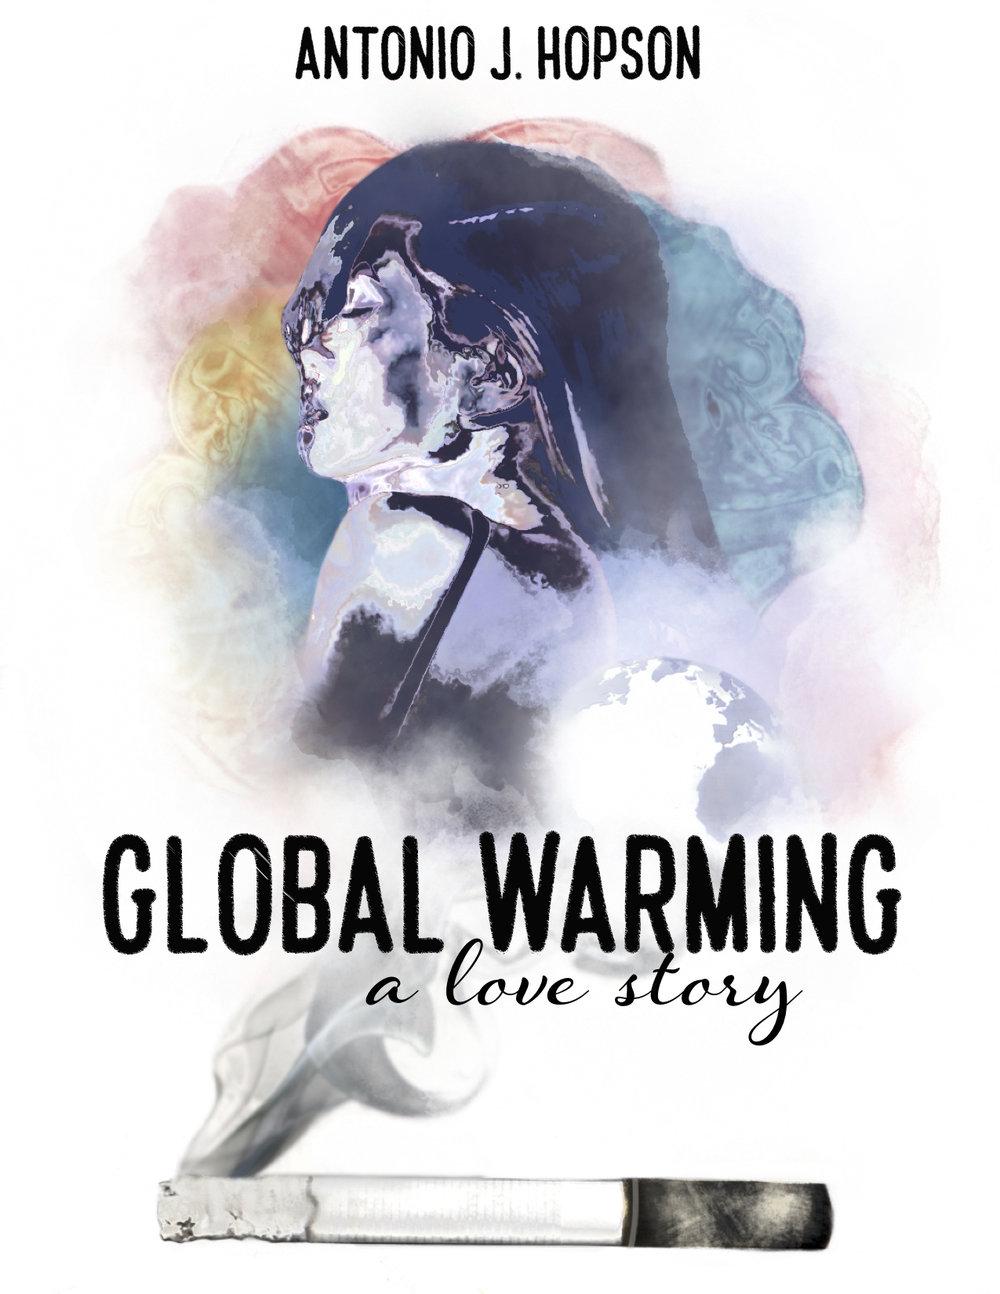 Antonio Hopson  Global warming.jpg